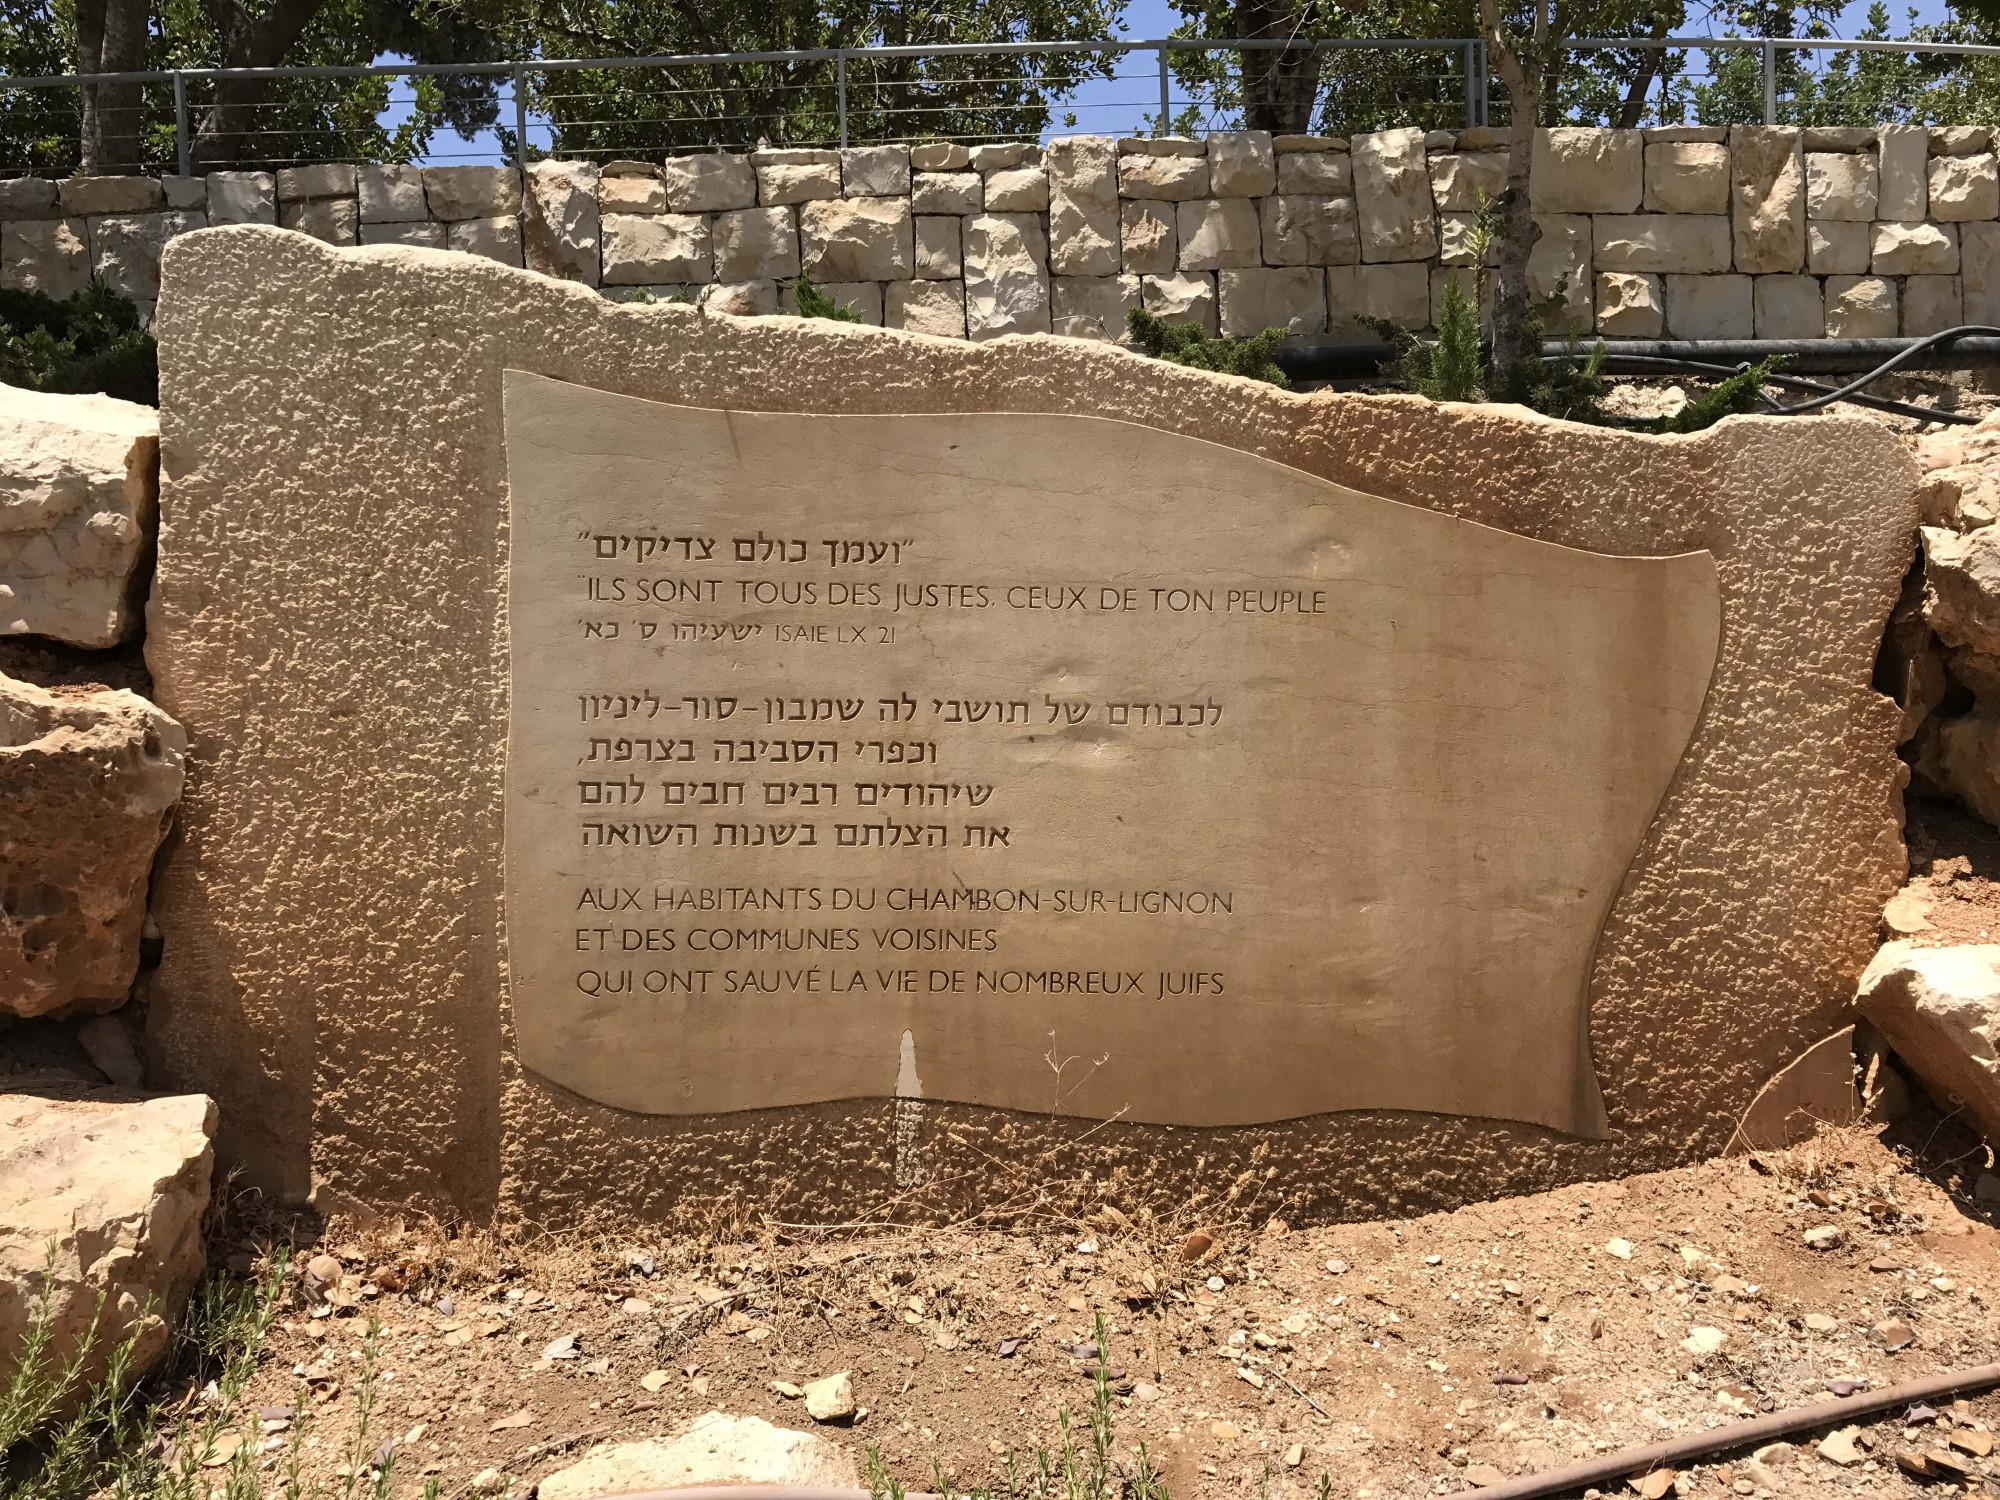 A monument at Yad Vashem at Holocaust Institute